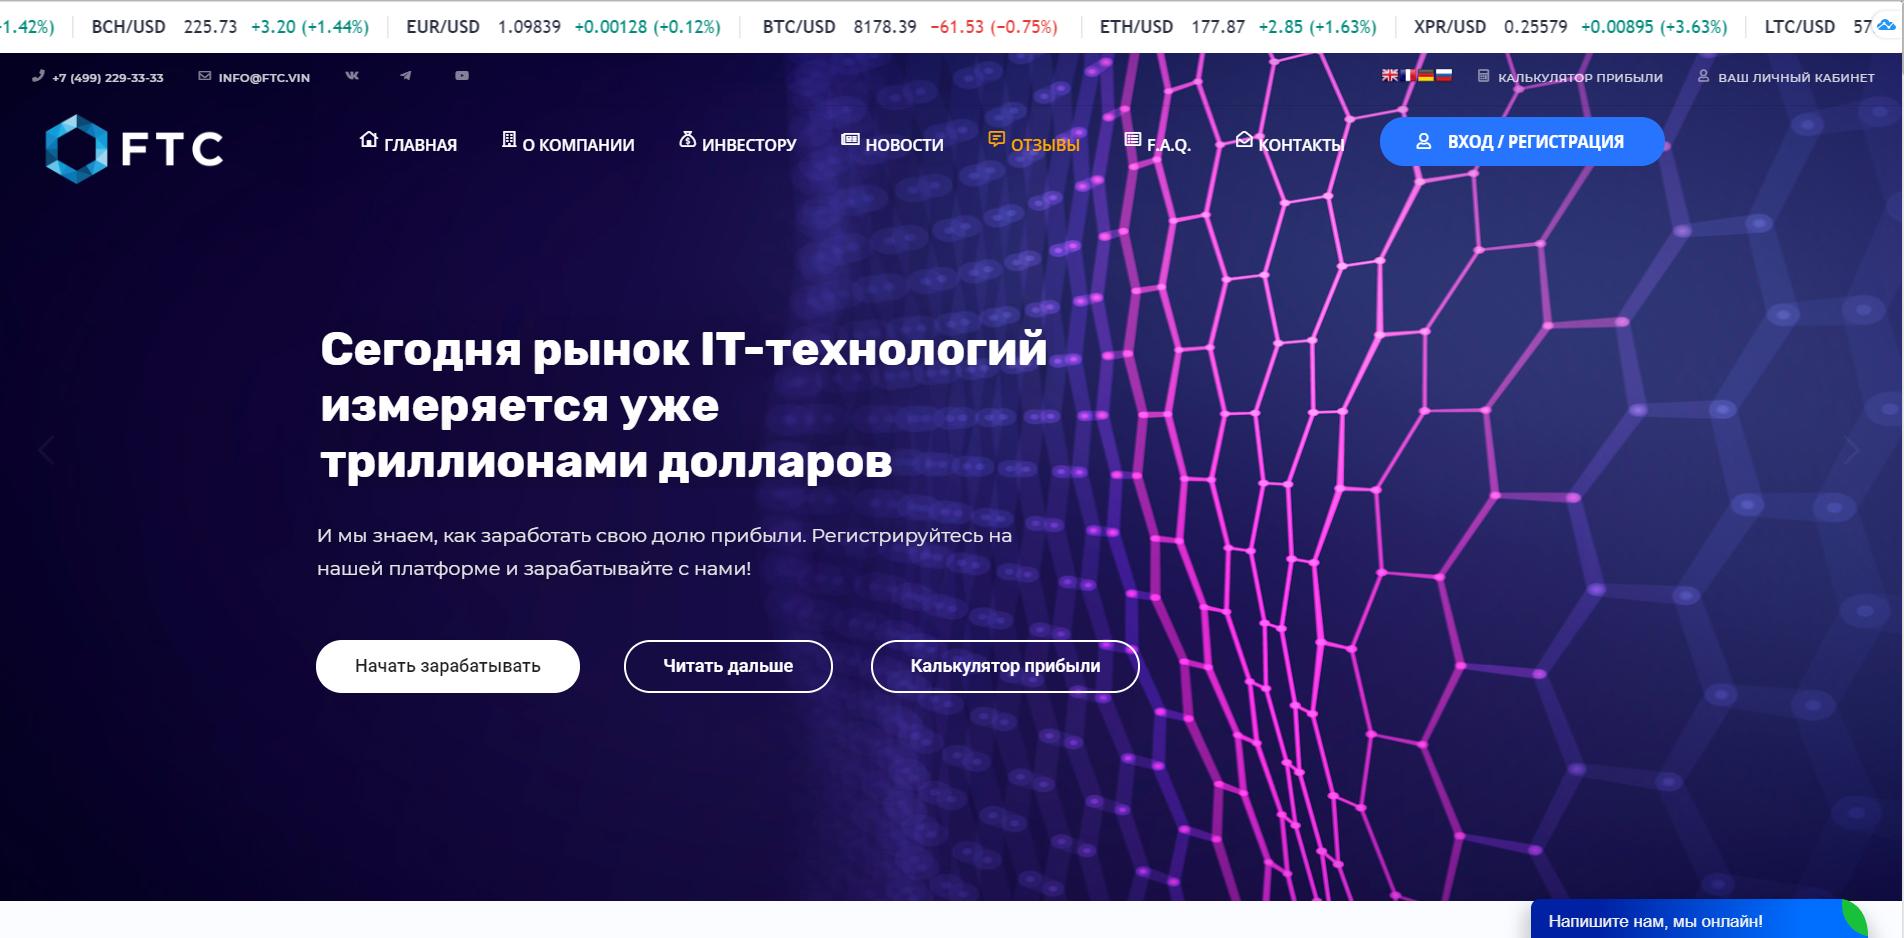 Сайт ftc.vin